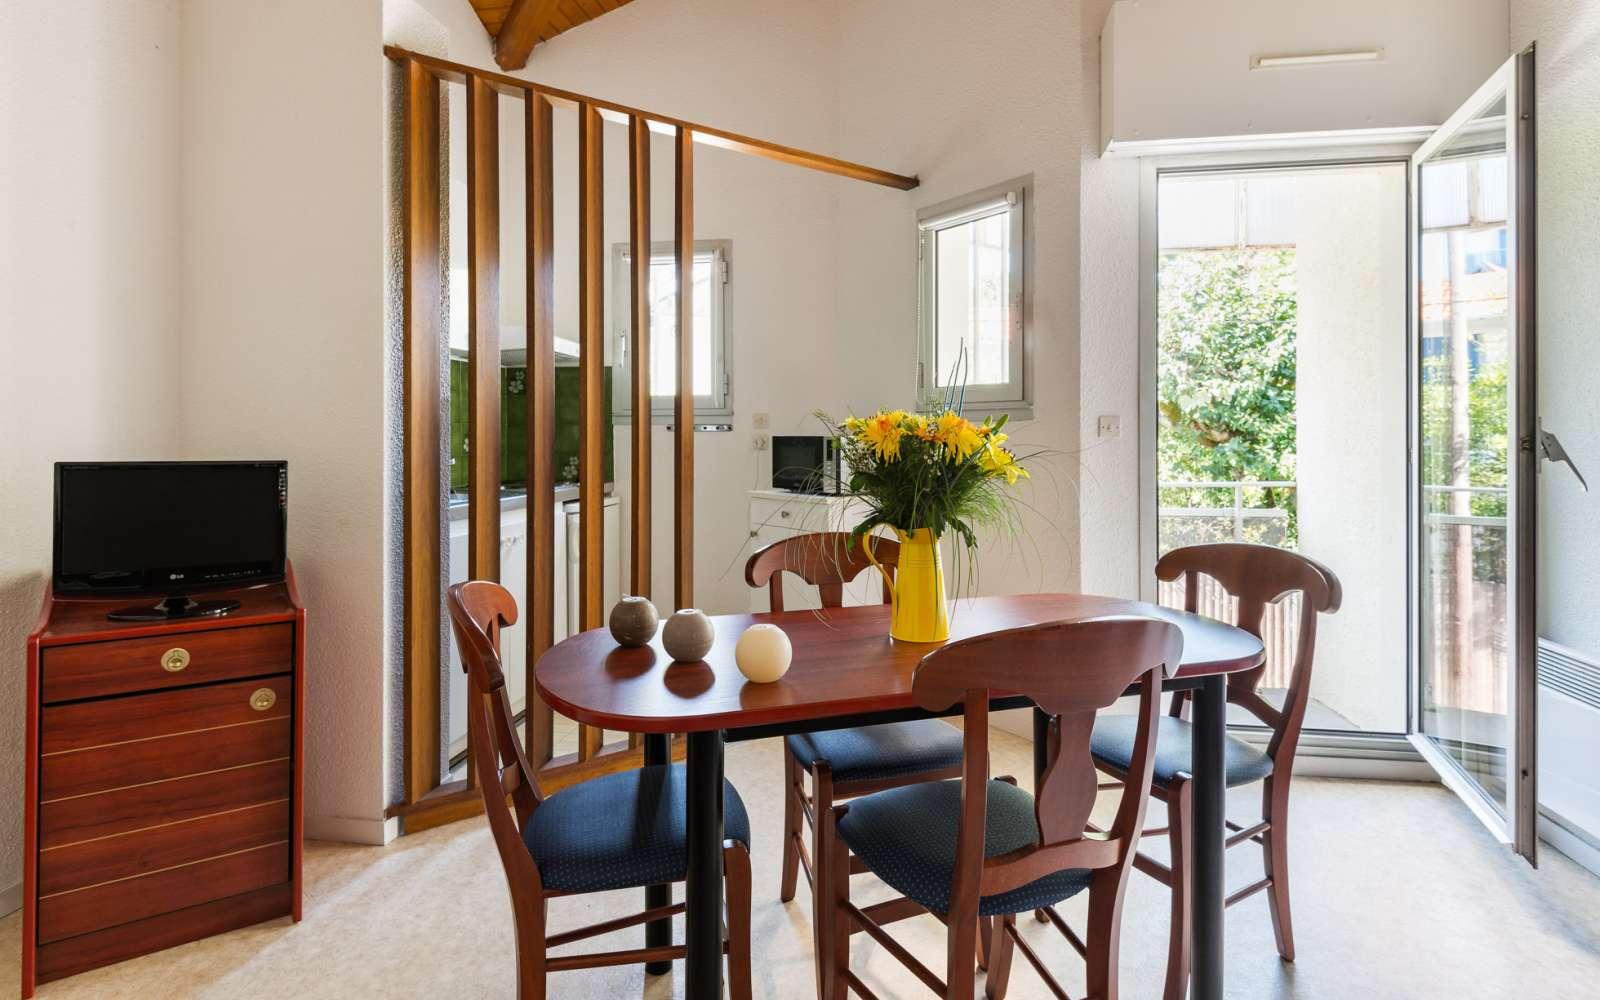 r sidence le phalene location vacances saint palais sur mer lagrange. Black Bedroom Furniture Sets. Home Design Ideas